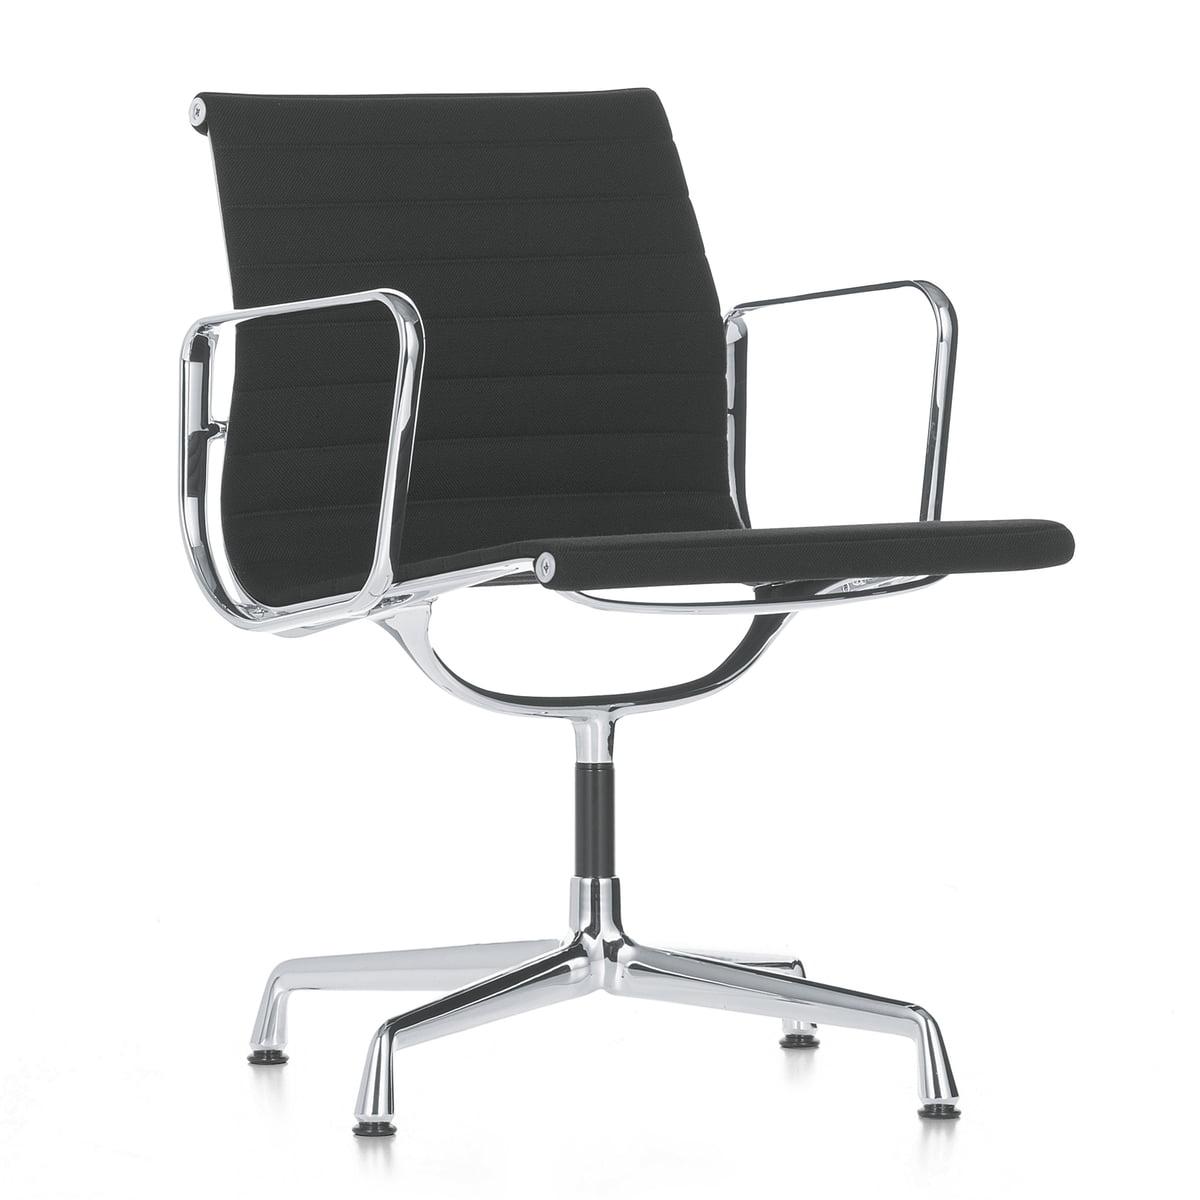 Chaise aluminium group ea 107 vitra connox for Chaise de bureau vitra prix